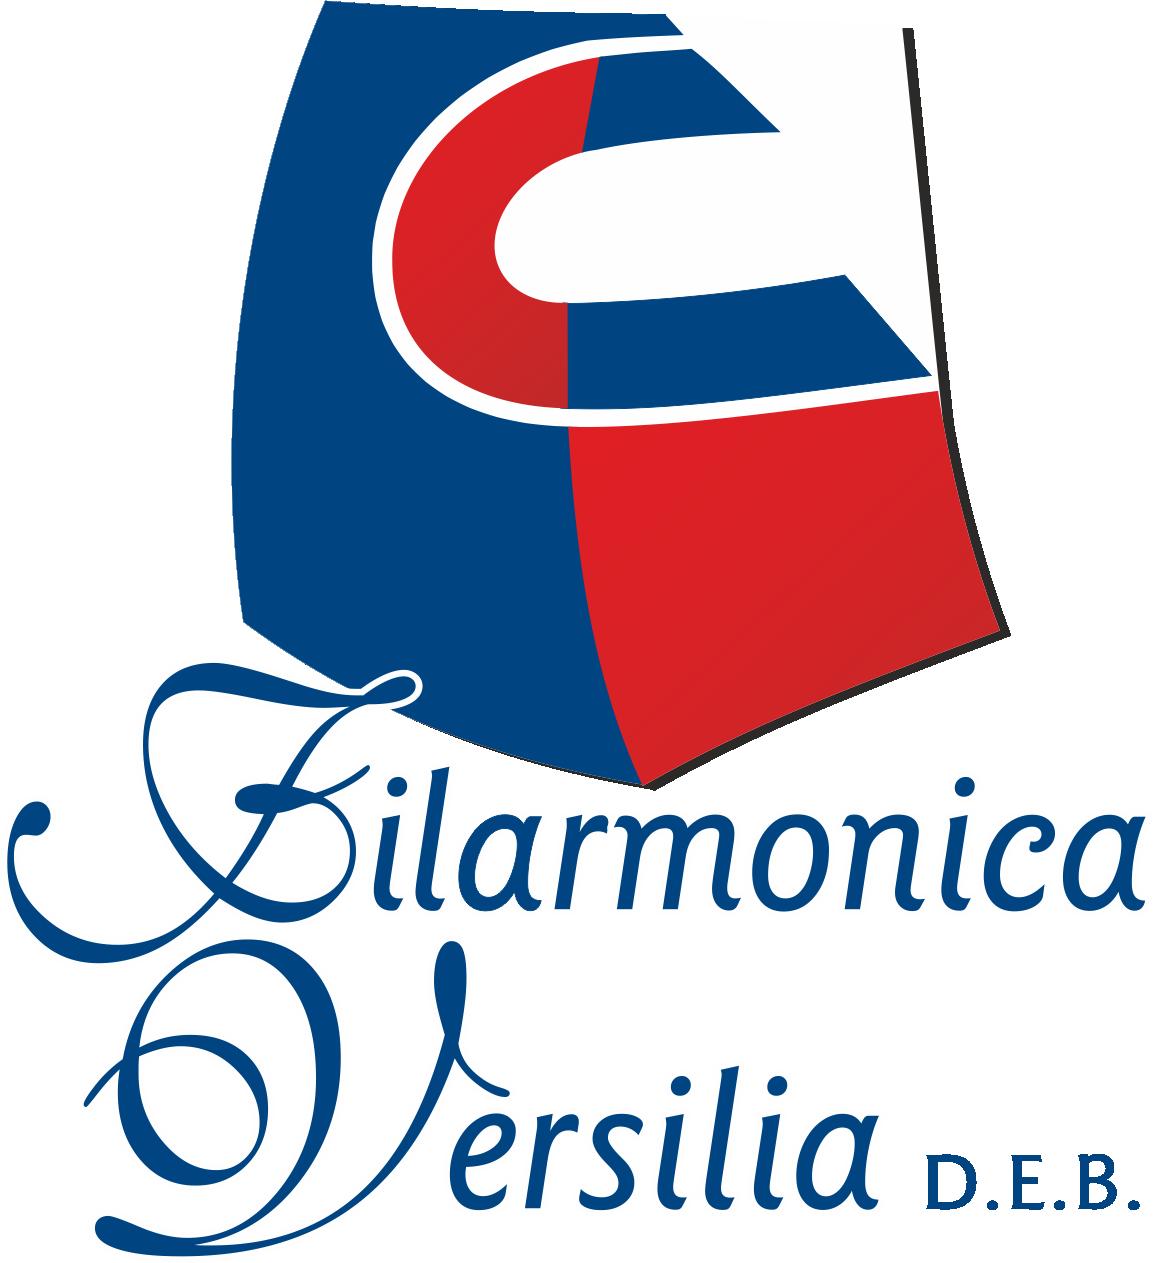 Logo Filarmonica Versilia D.E.B.